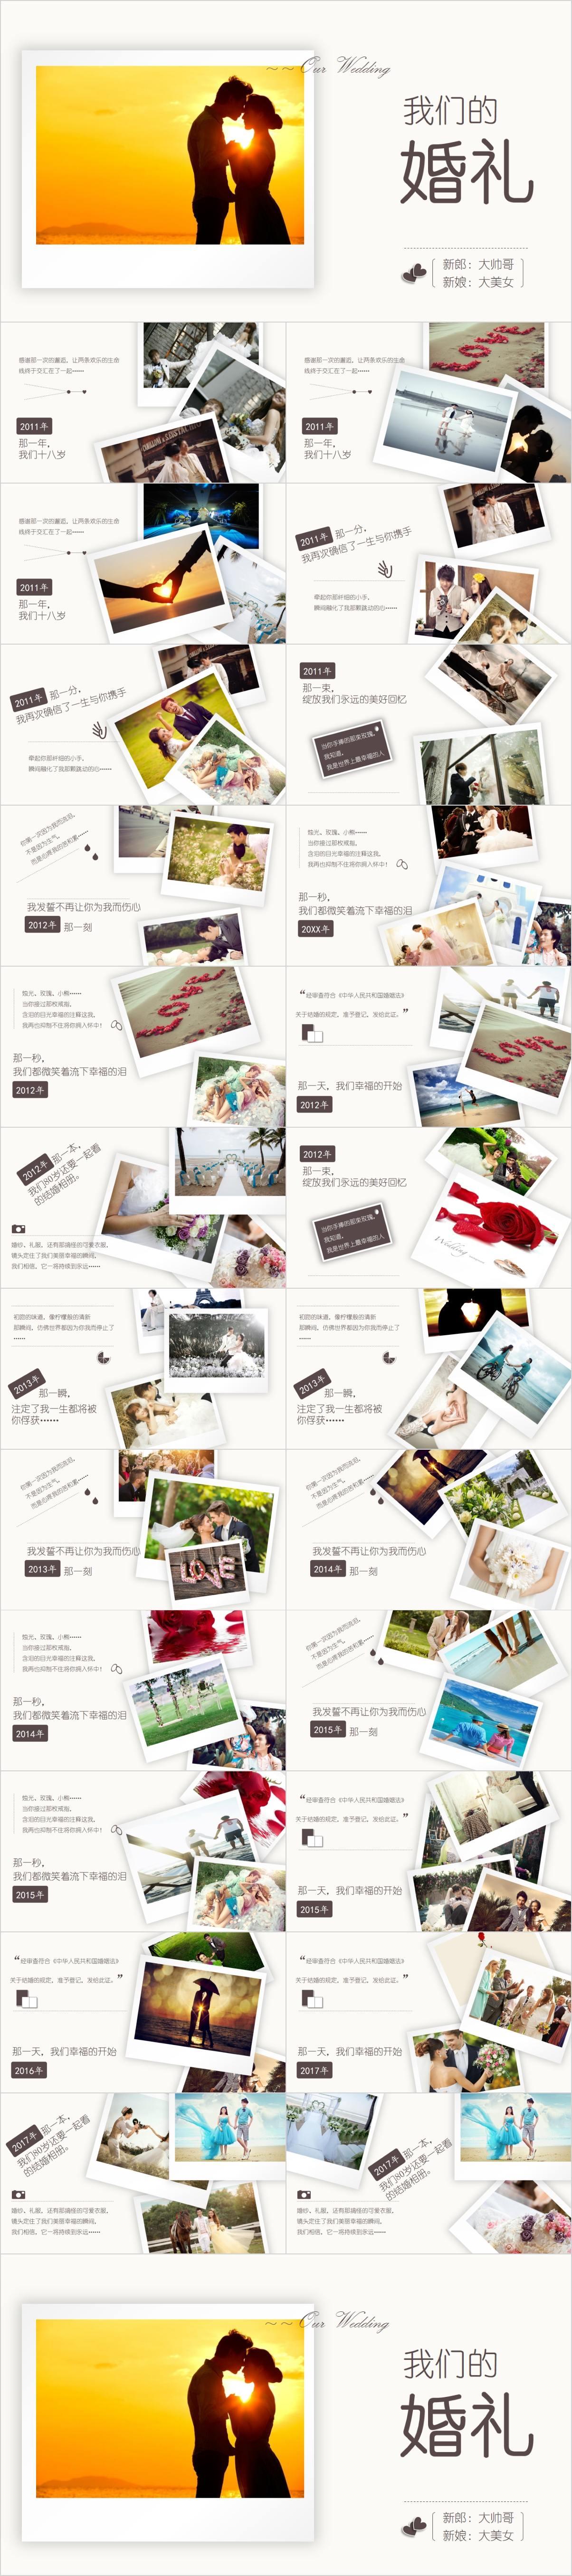 VC0130 温馨浪漫婚礼PPT模板